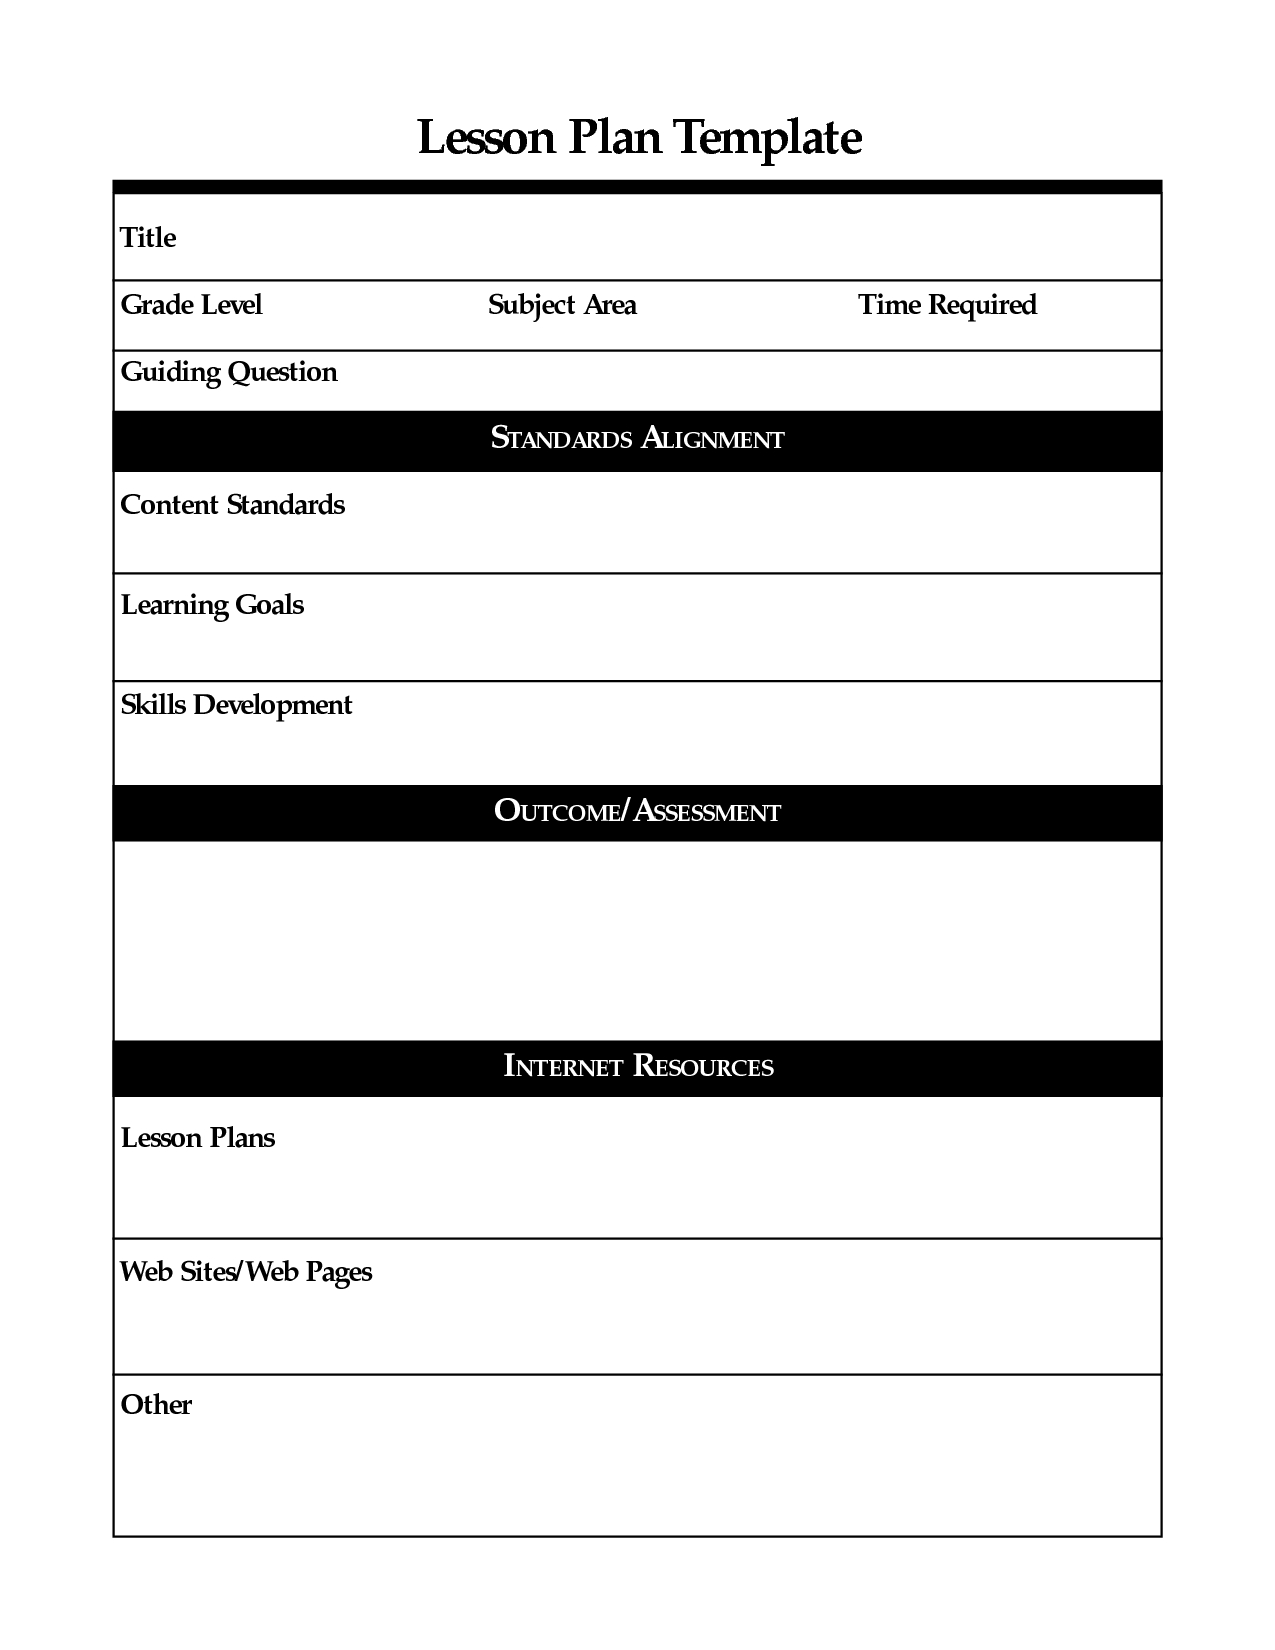 Printable Lesson Plan Template, Free To Download - Free Printable Lesson Plan Template Blank